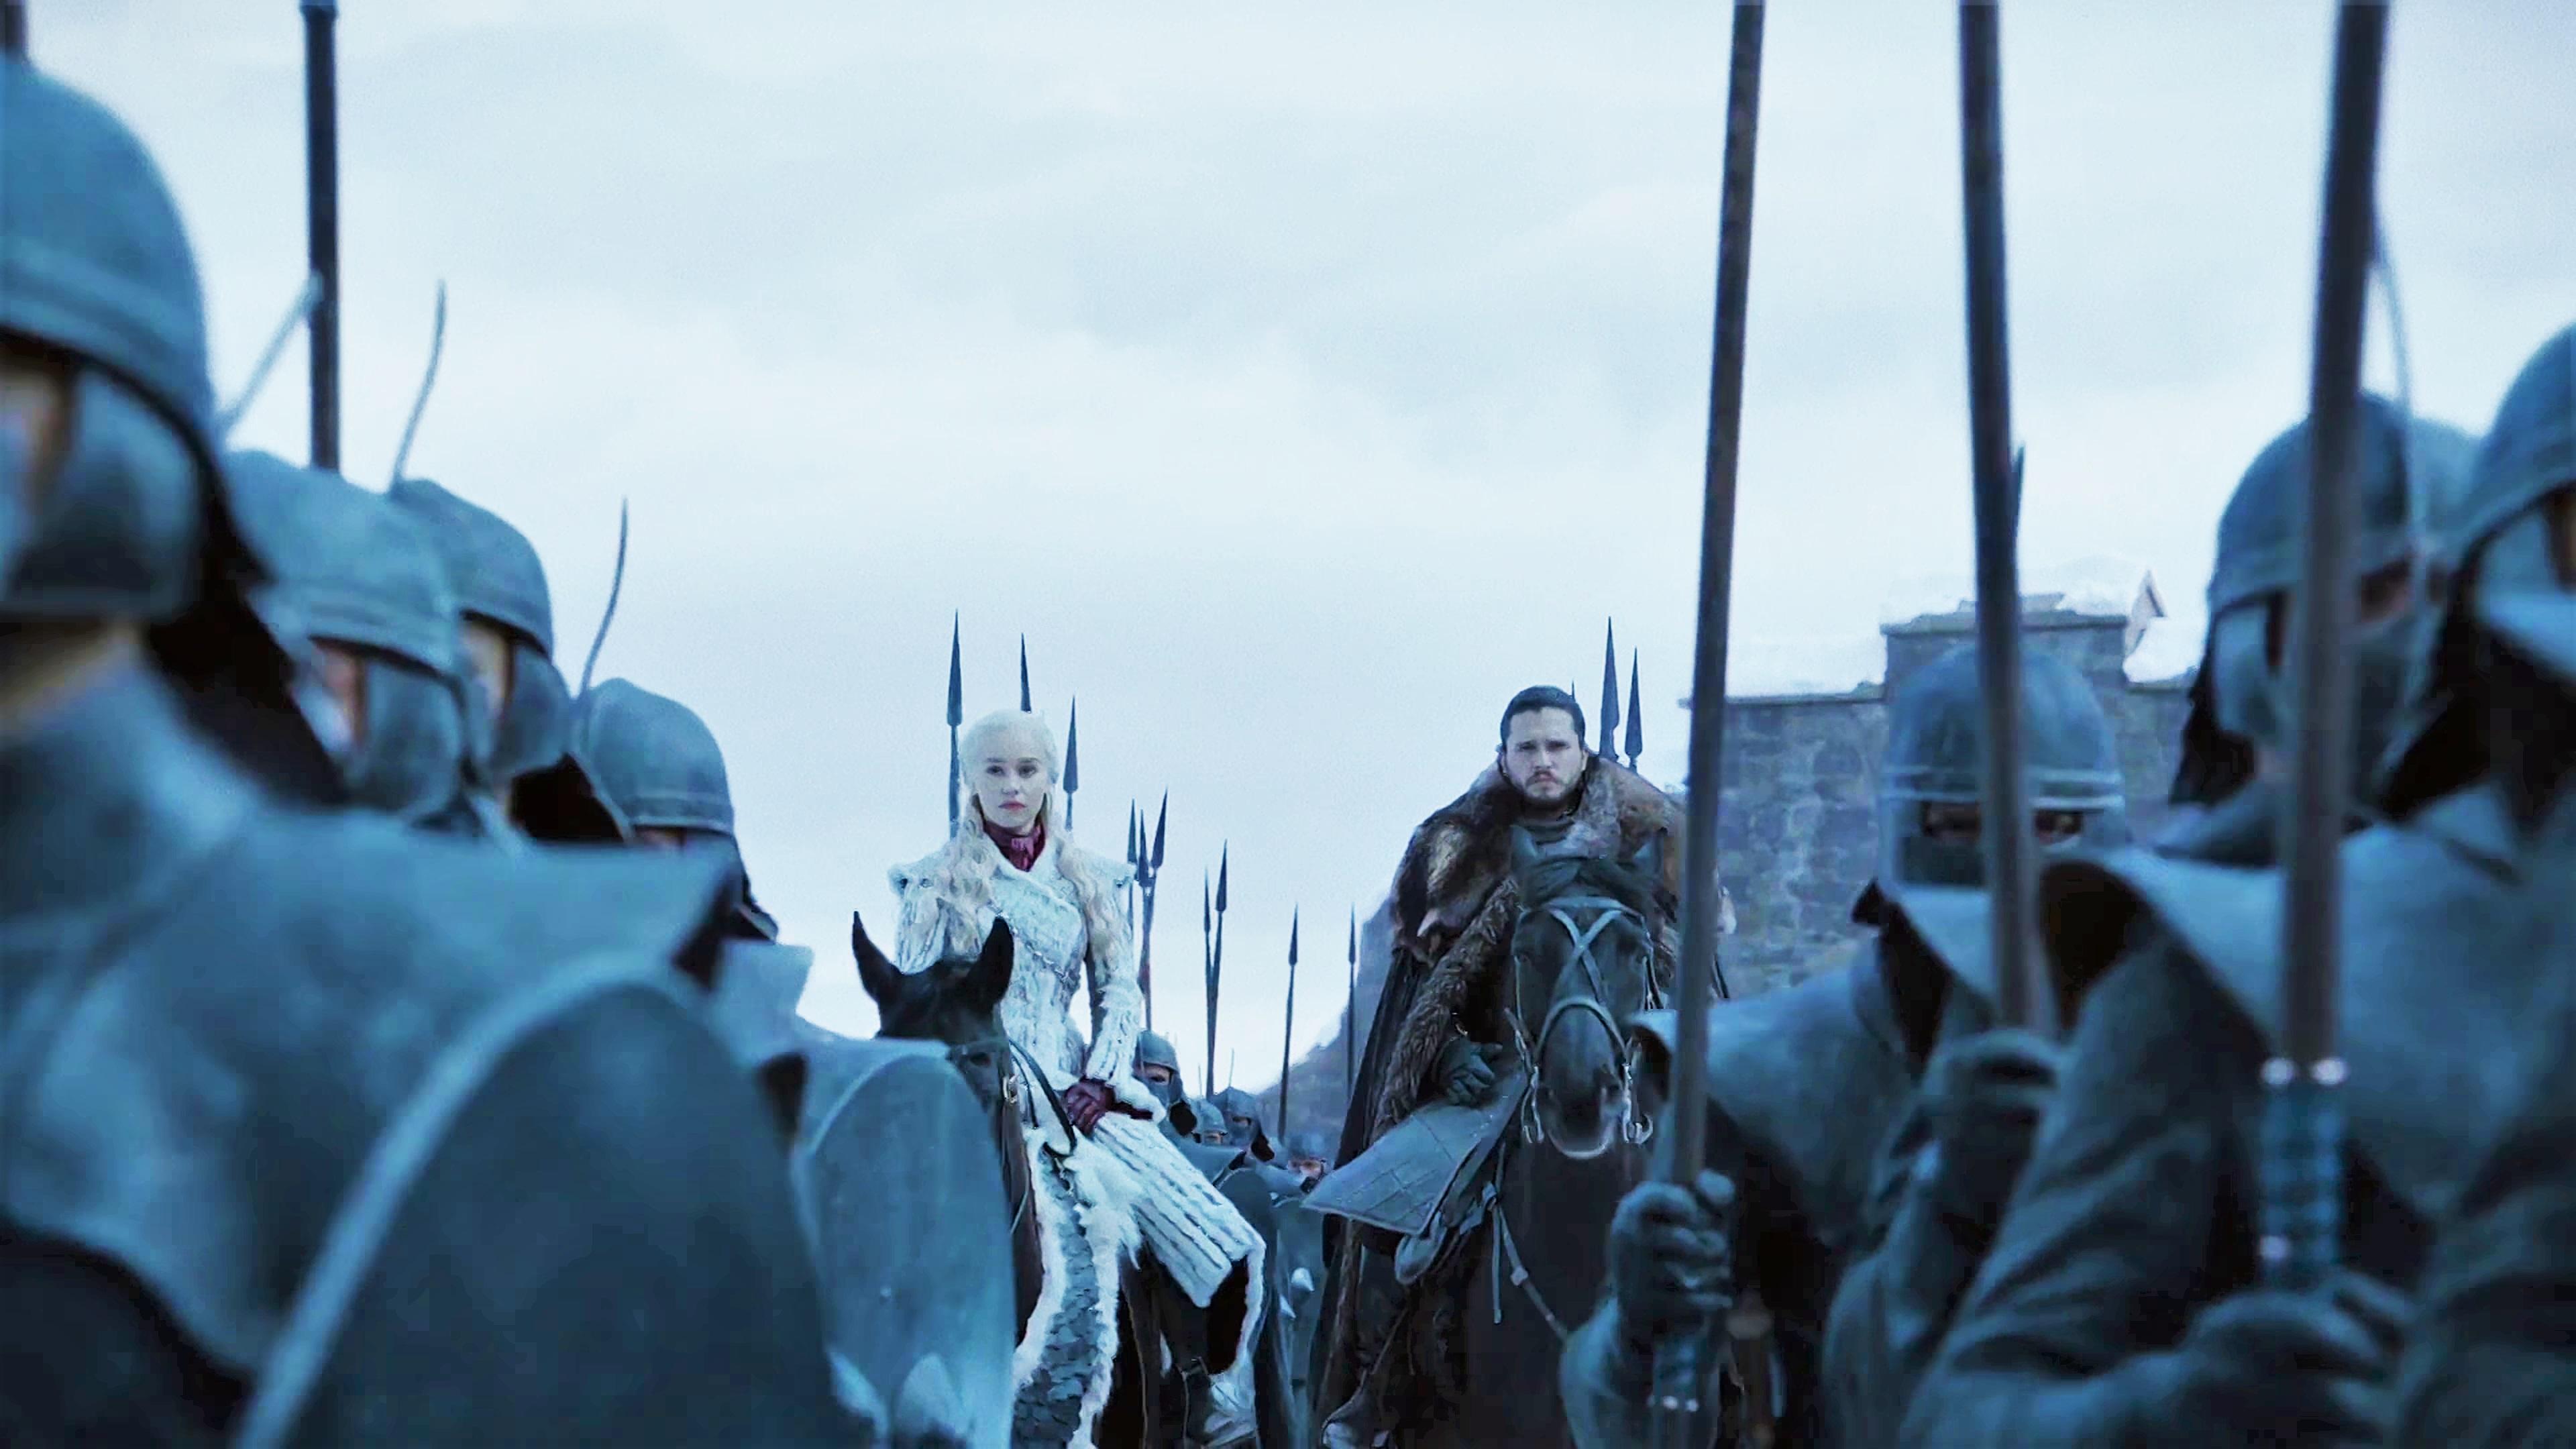 13. Season 8 Trailer Jon Snow Daenerys Targaryen Unsullied Winterfell Arrival